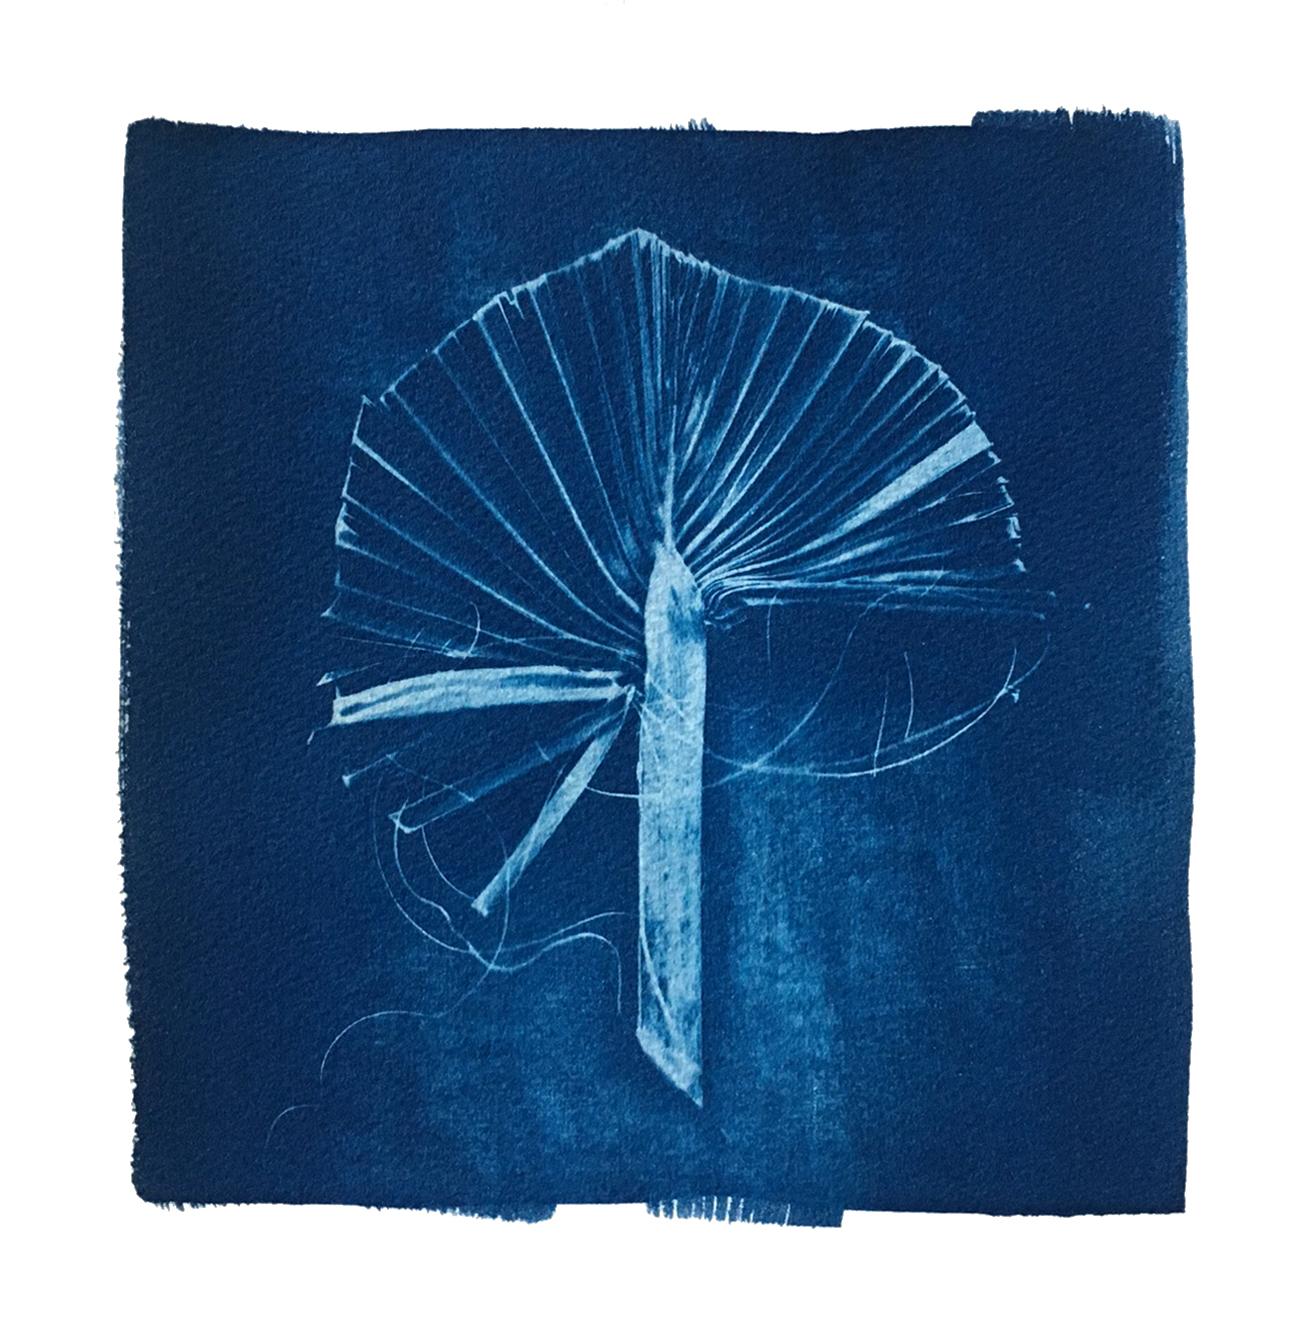 "TITLE /  Sabal Minor Fan  MEDIUM /  Cyanotype Print, Printed on 100% Cotton Paper  SIZE /  9"" x 9""  PRICE /  SOLD"